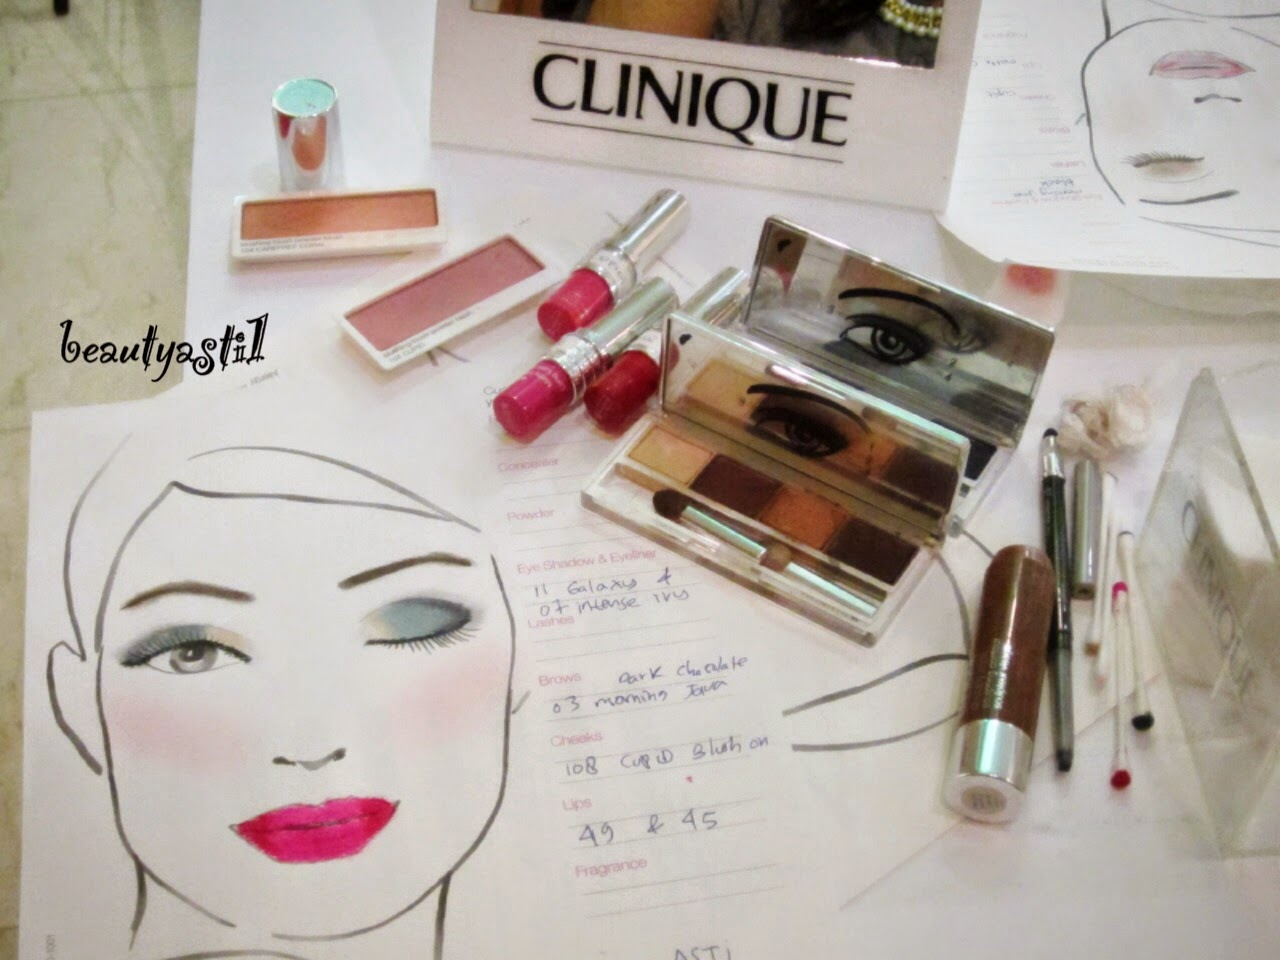 clinique-face-chart-by-beautyasti1.jpg